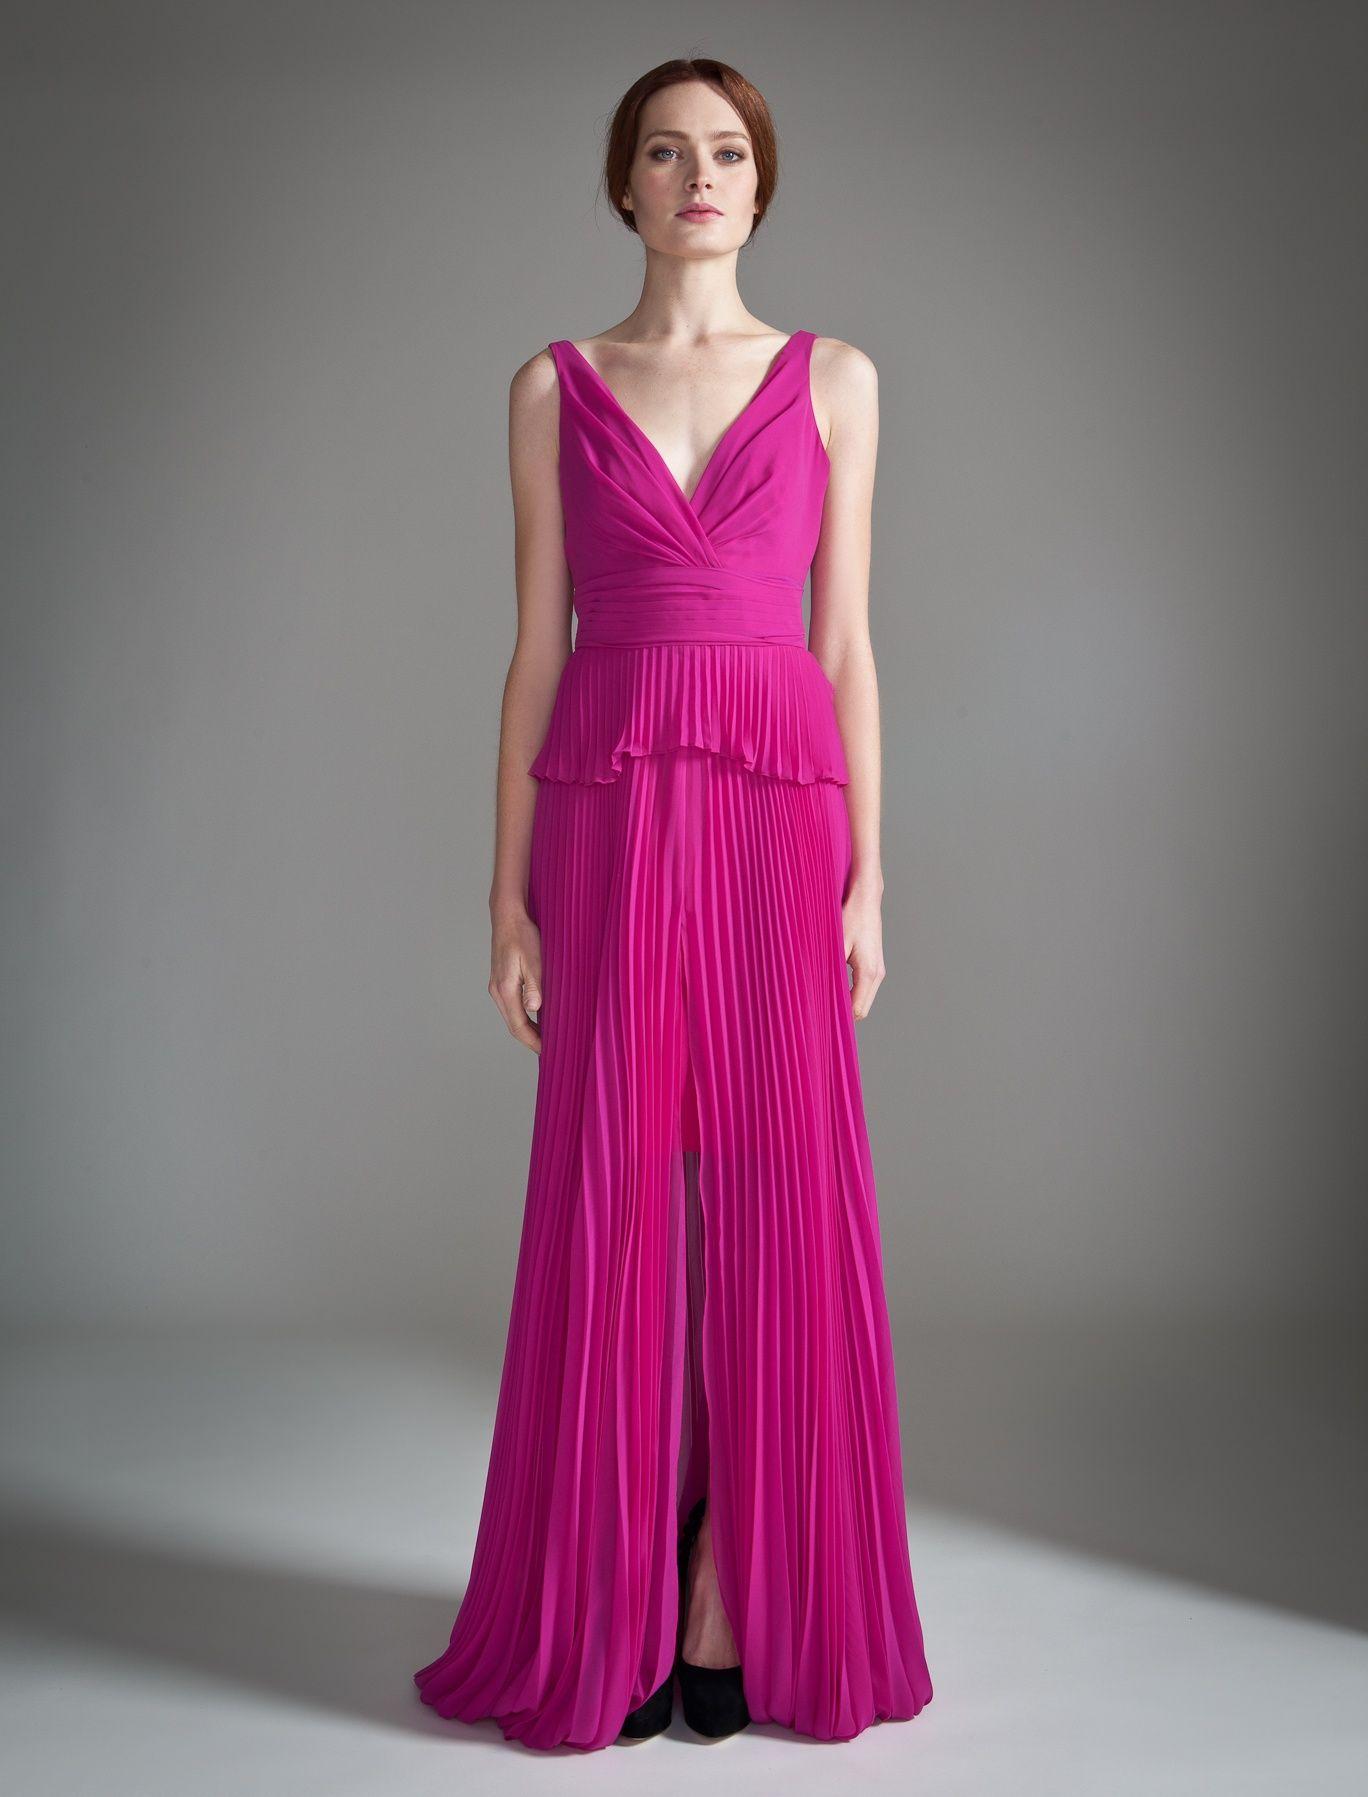 Temperley London SS2013 Long Serena Dress. $1995